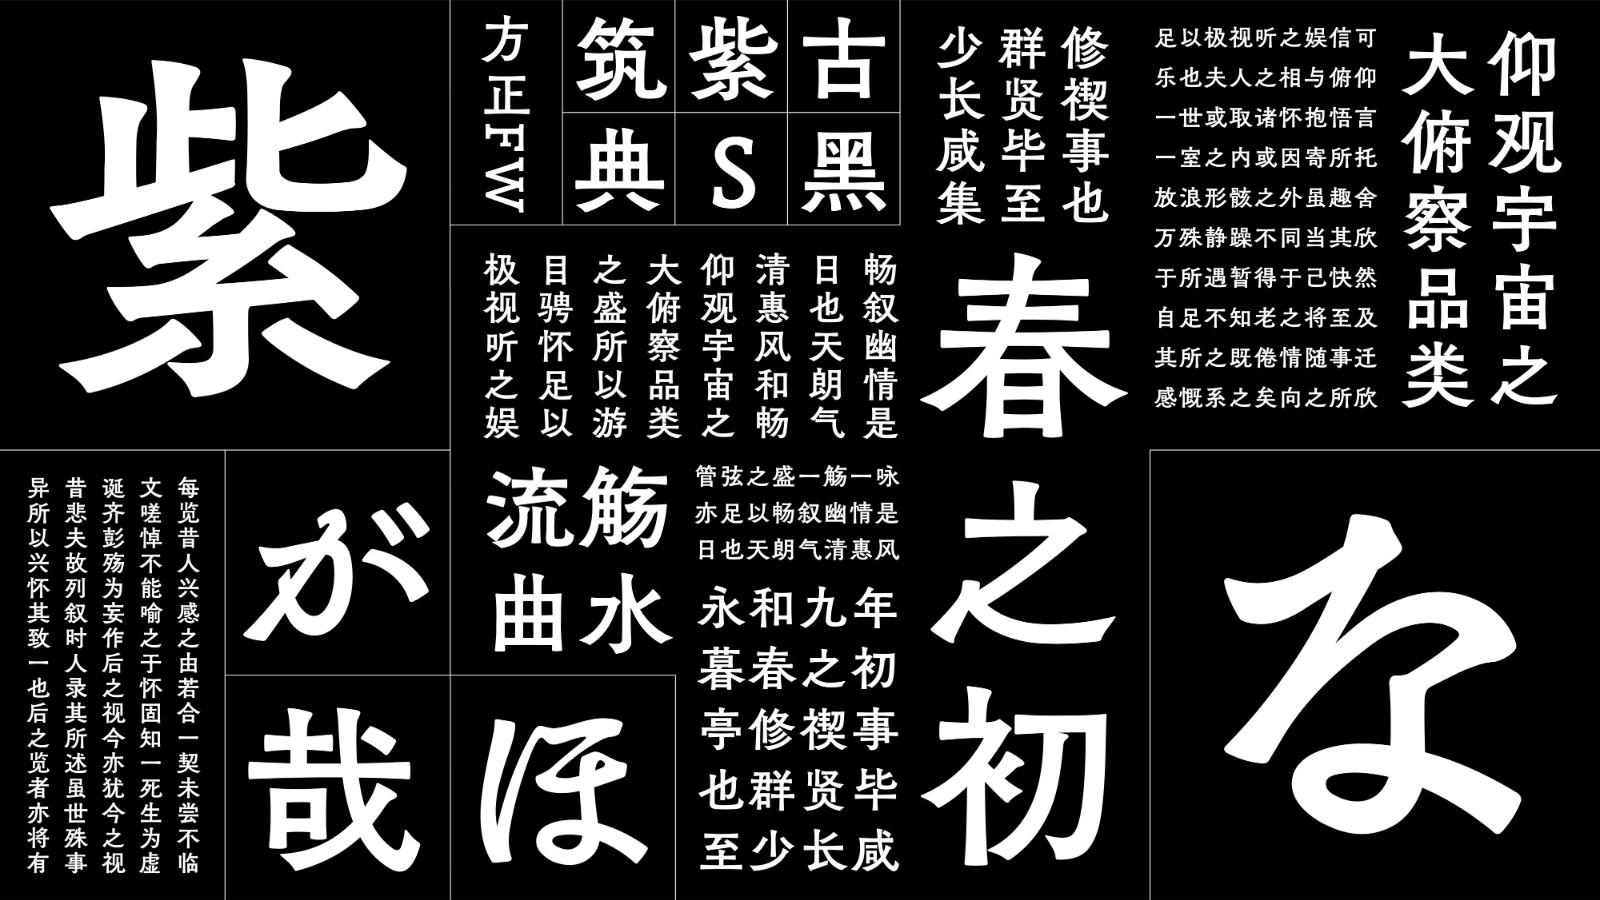 https://ft-bk1.oss-cn-zhangjiakou.aliyuncs.com/Public/Uploads/img/n_content_20201210175726_9036.jpg